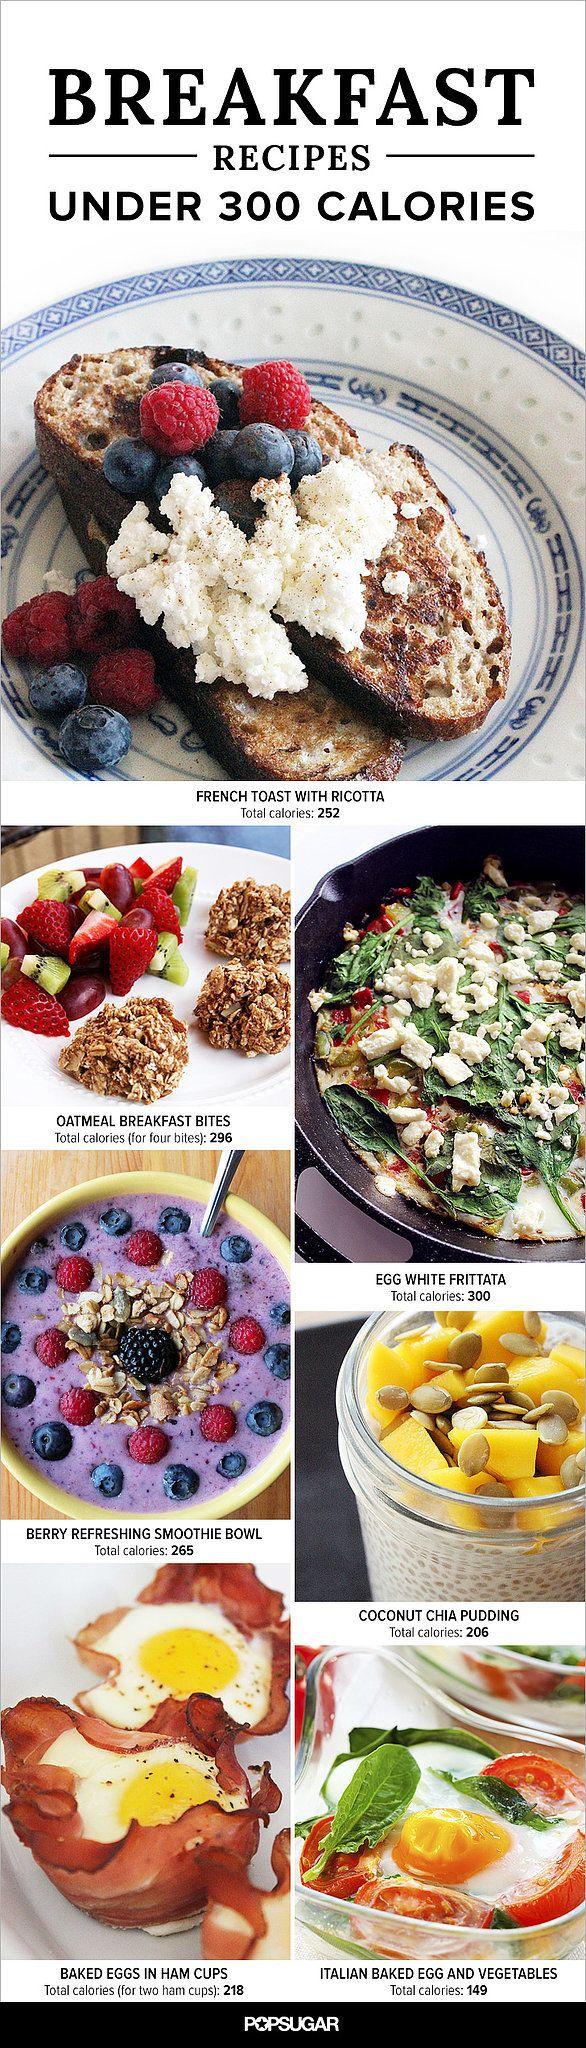 18 Satisfying Breakfasts Under 300 Calories